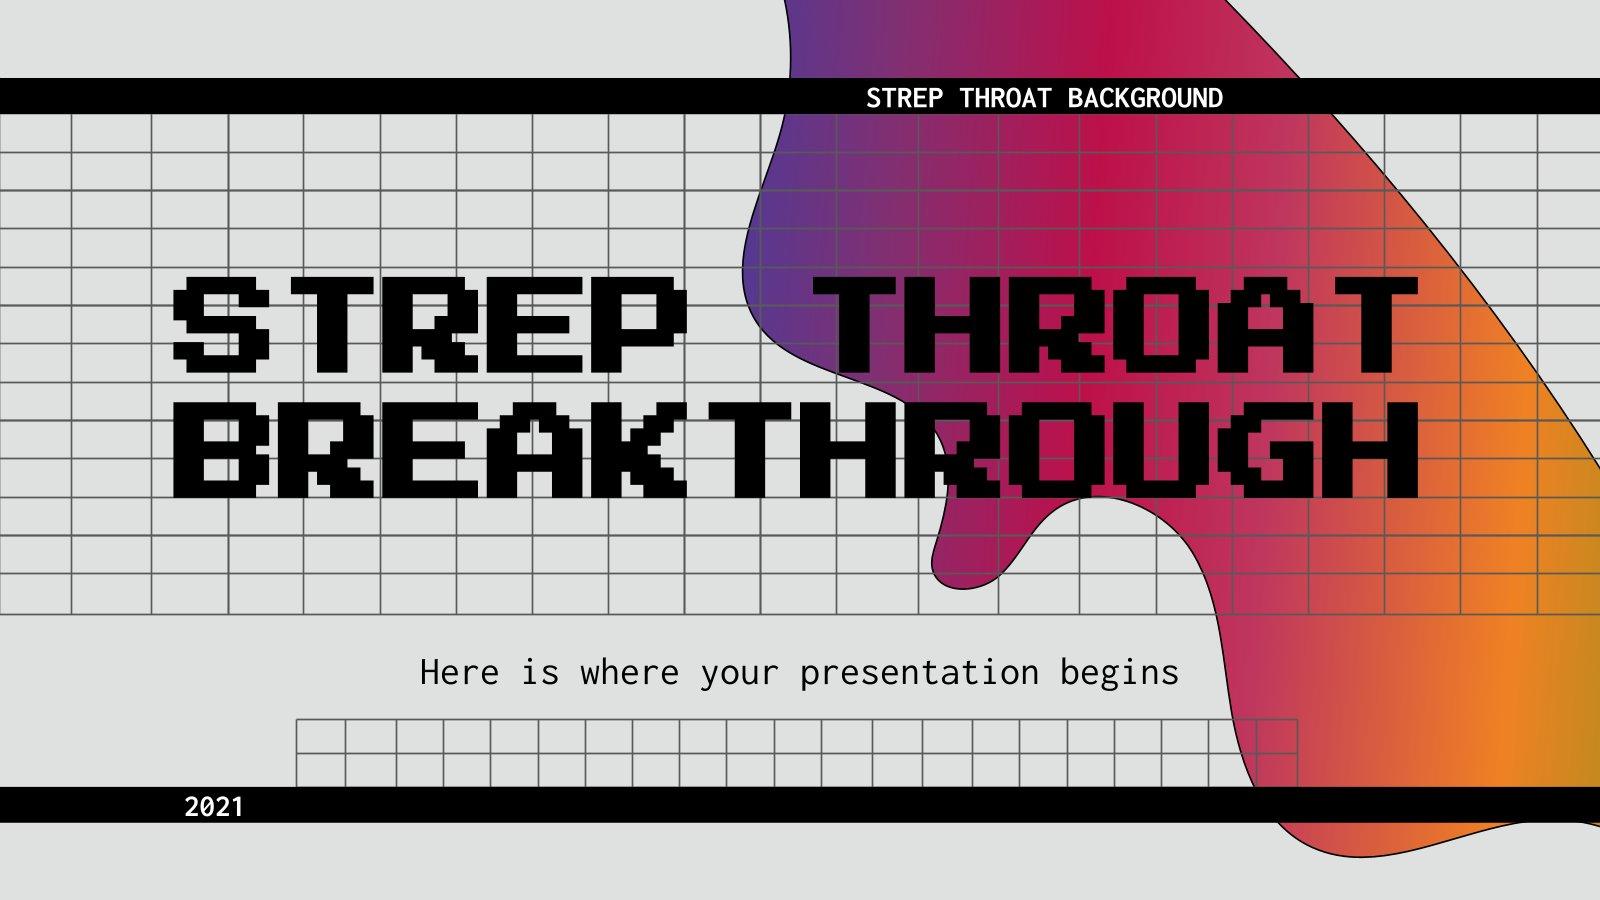 Strep Throat Breakthrough presentation template